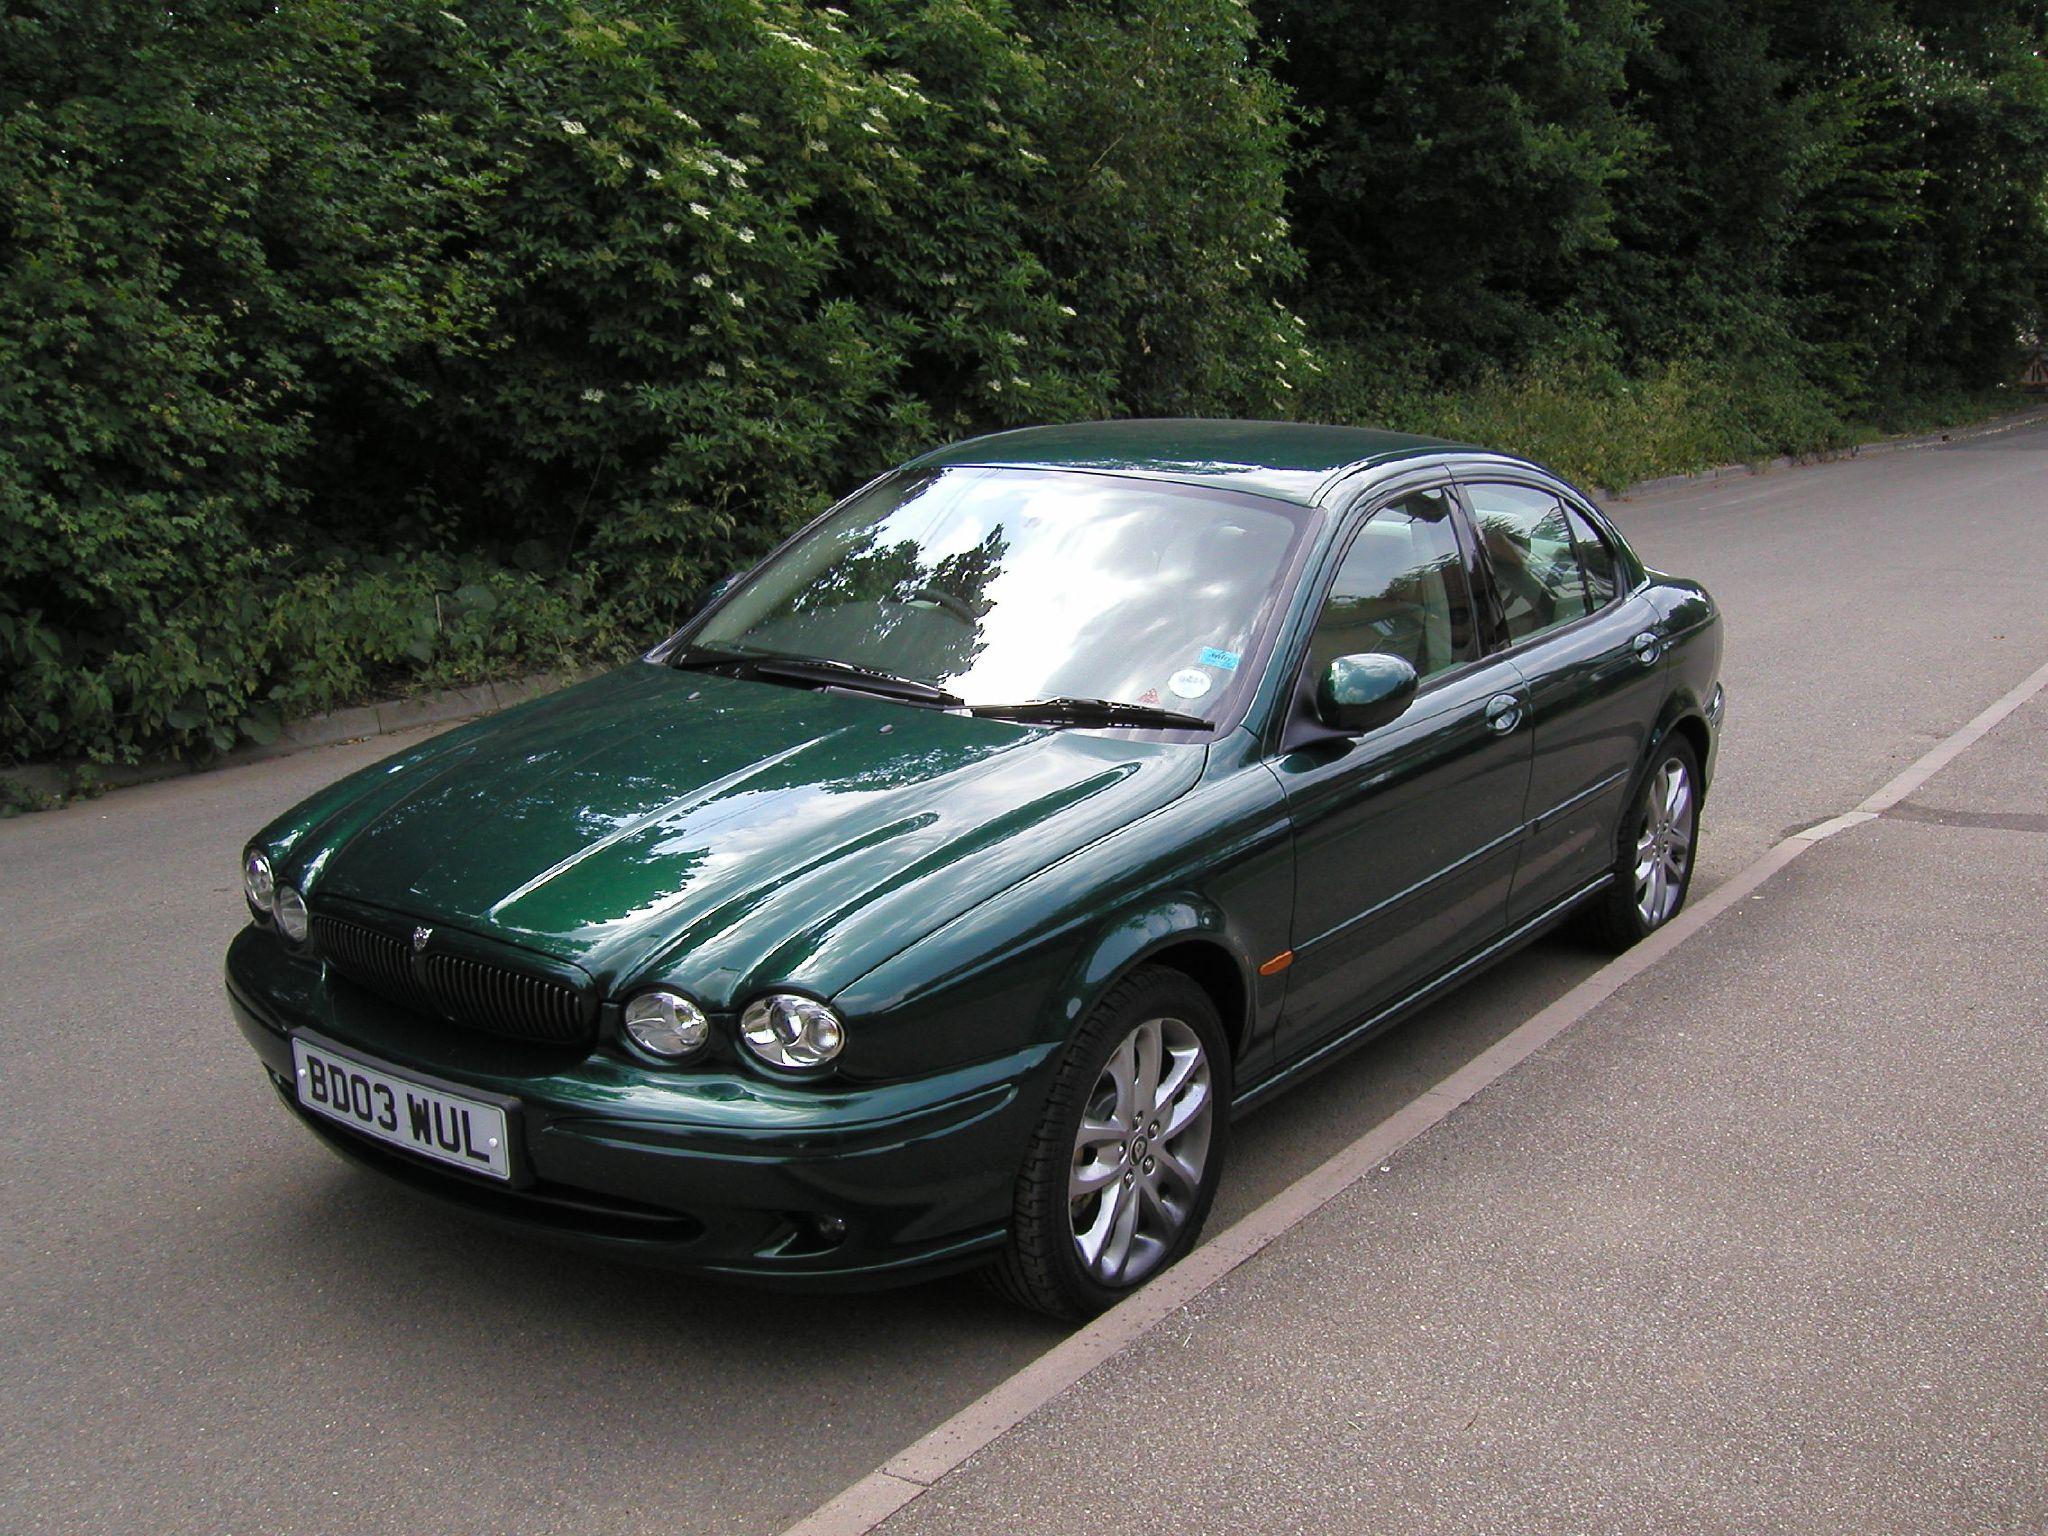 File:Jaguar X Type 3 Litre Sport. The Only Jag I Ever Had.